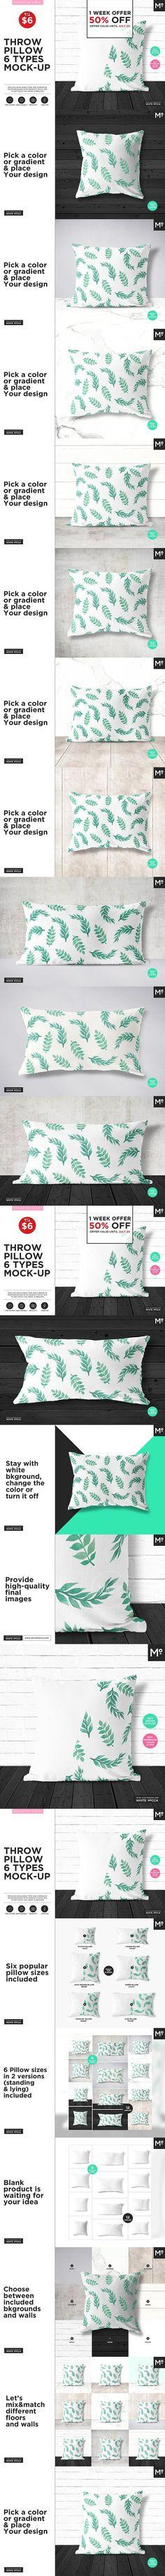 6x Throw Pillow Types Mock-up. Product Mockups